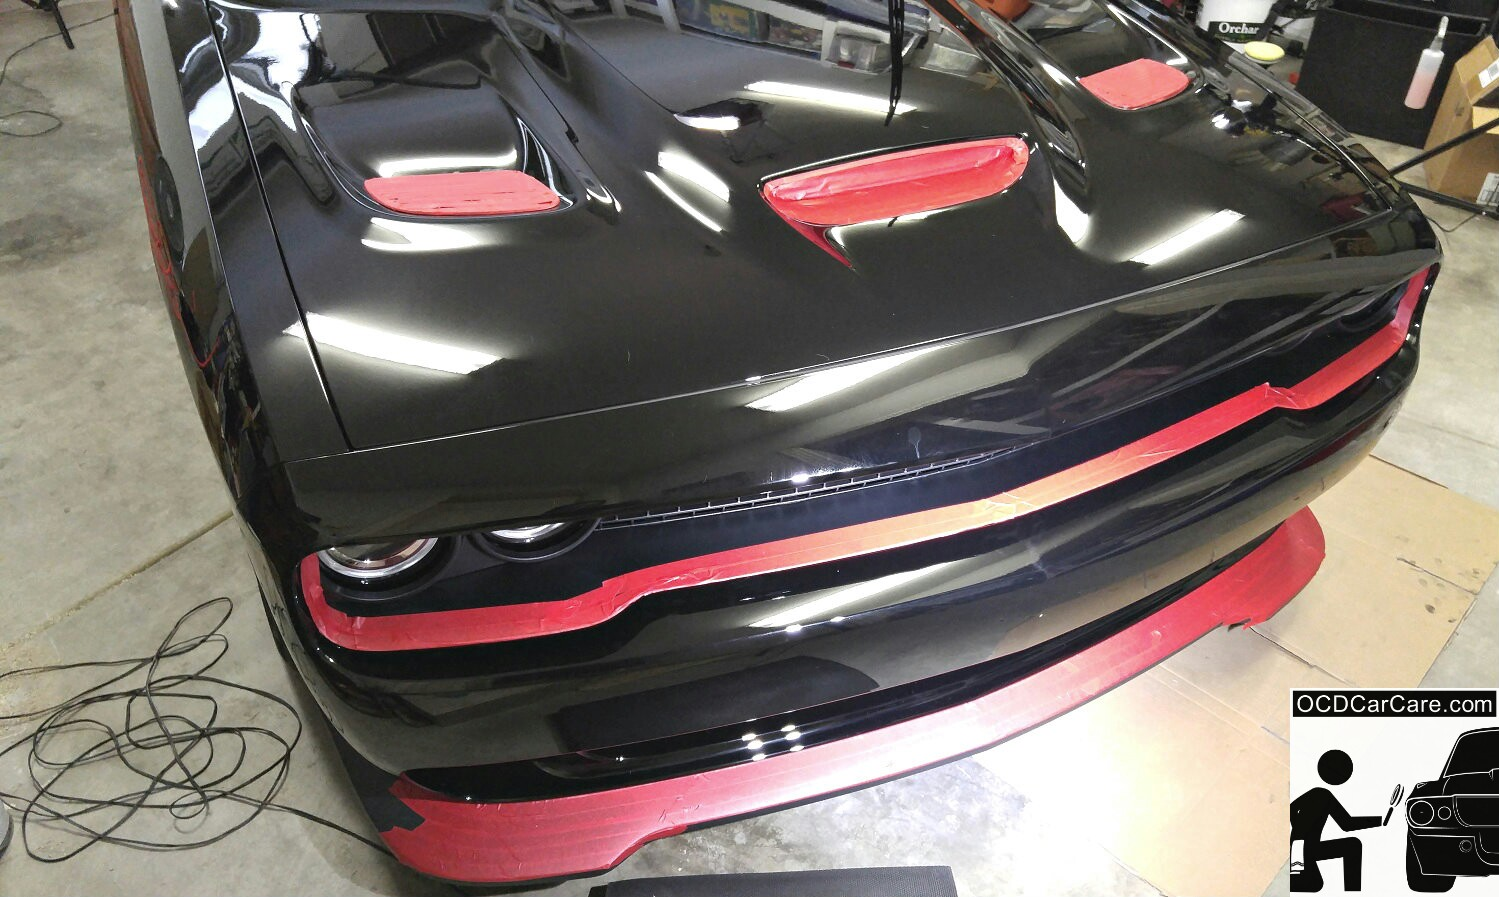 Challenger Hellcat CQuartz Finest Detailing in Los Angeles & Pasadena - Glass Paint Coating - CarPro, Meguiars, Rupes